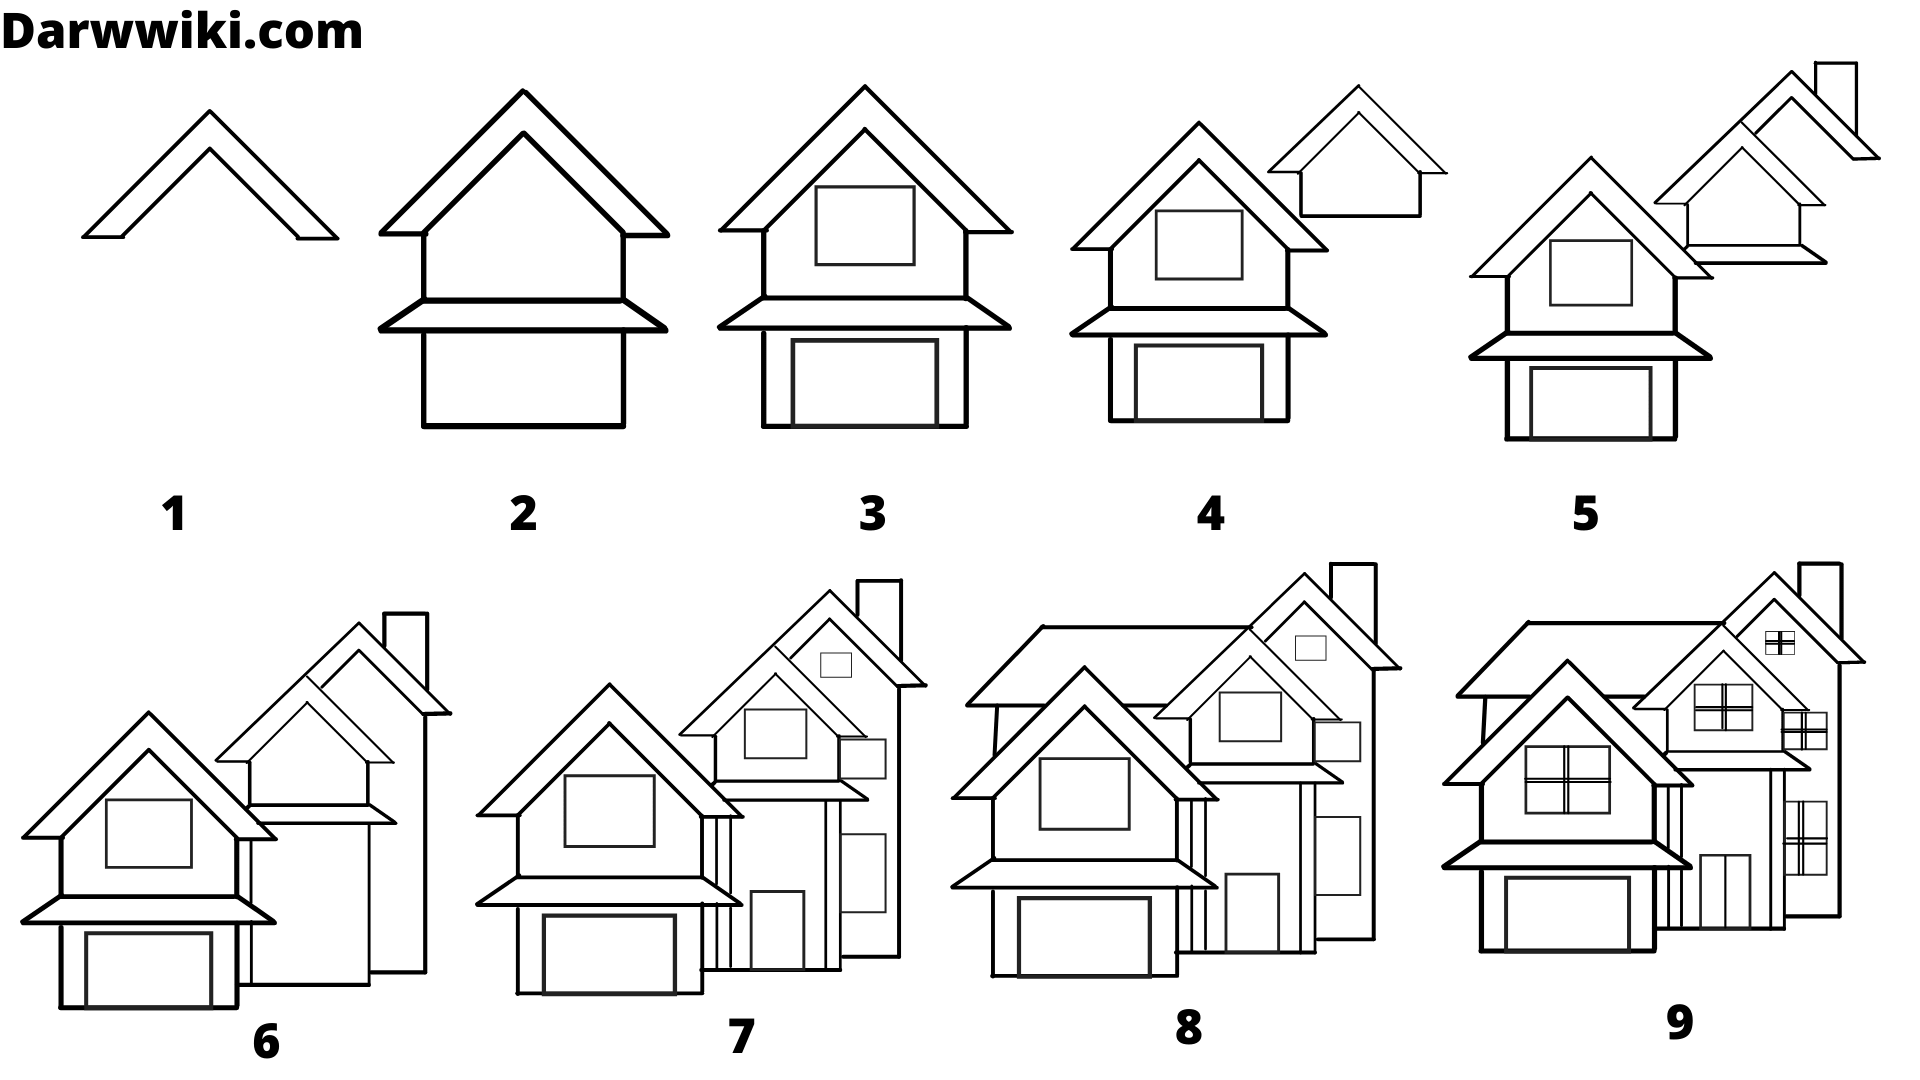 House drawing step by step, House Drawing ,Step by step house drawing